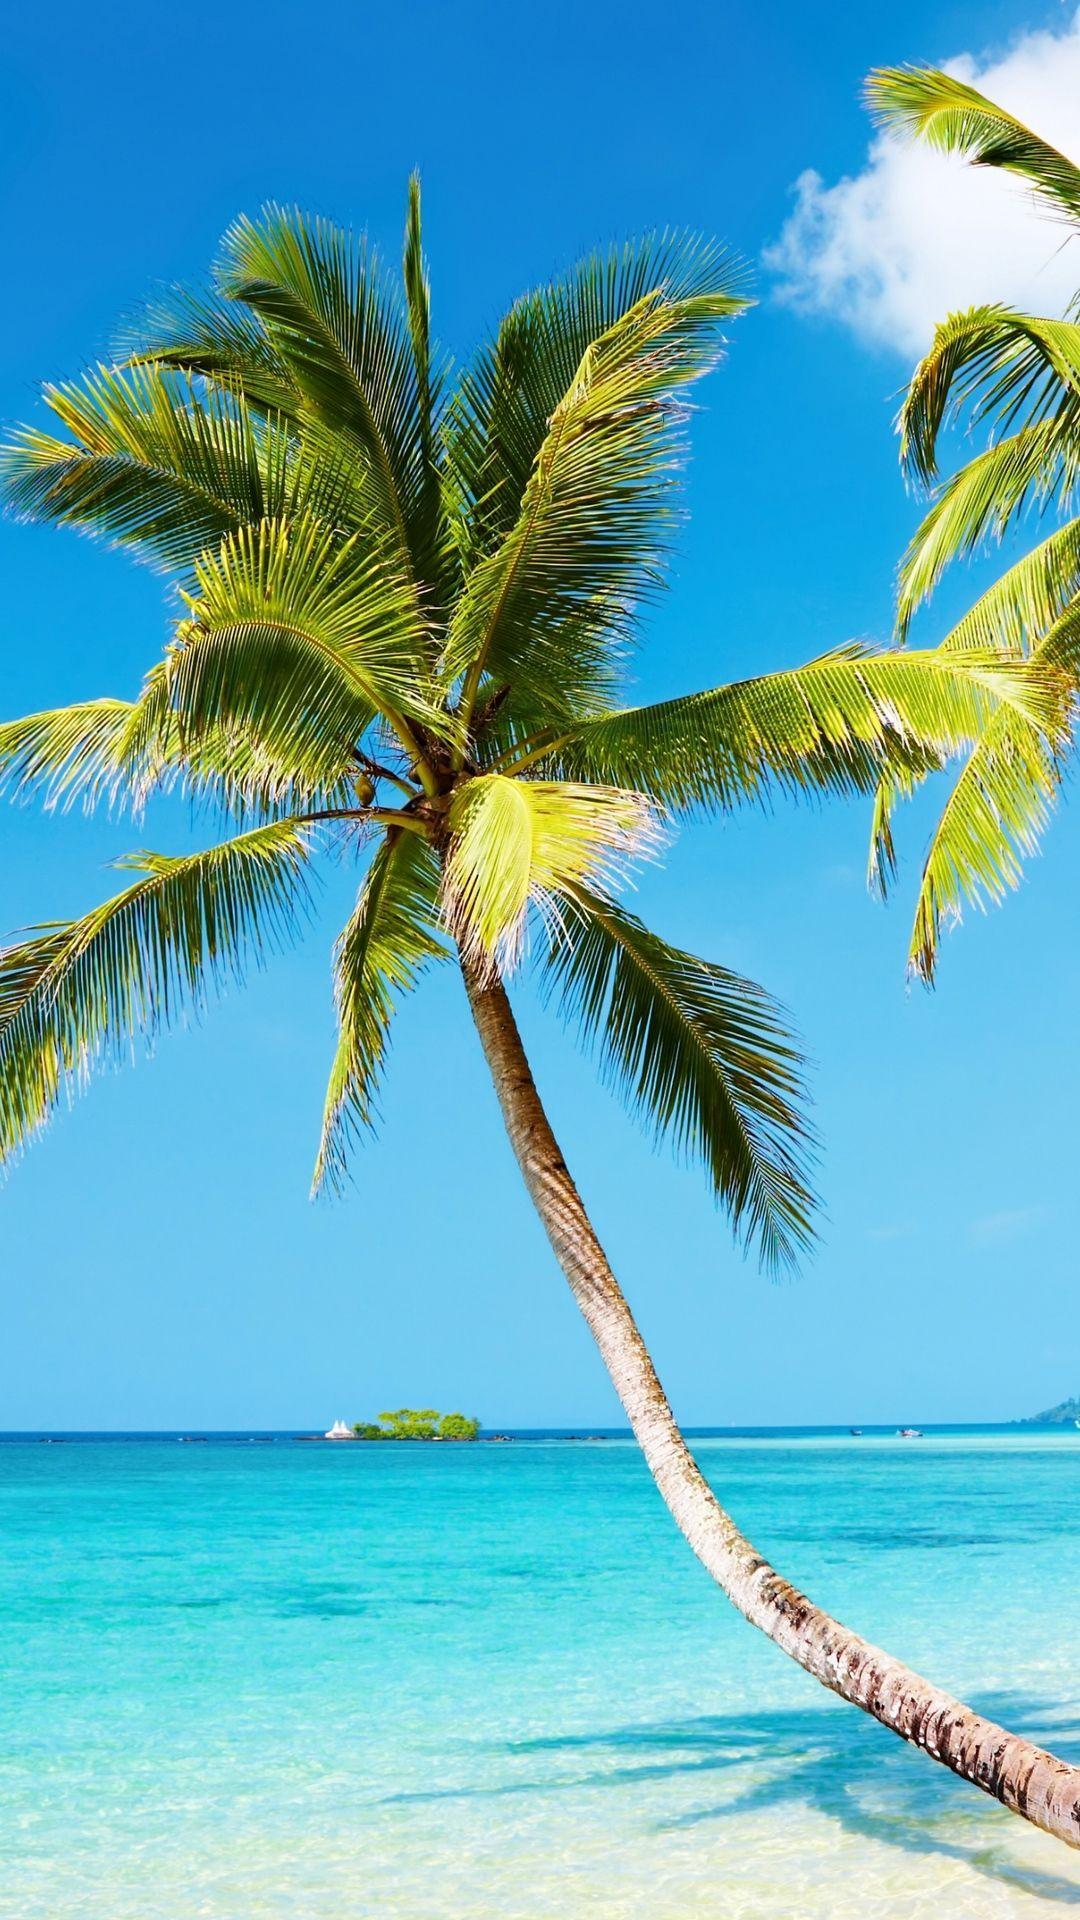 1080x1920 4k Wallpaper Beach Nature Beach Iphone 6 Plus 1080x1920 Wallpaper Beach Wallpaper Iphone Beach Wallpaper Iphone Wallpaper Tropical